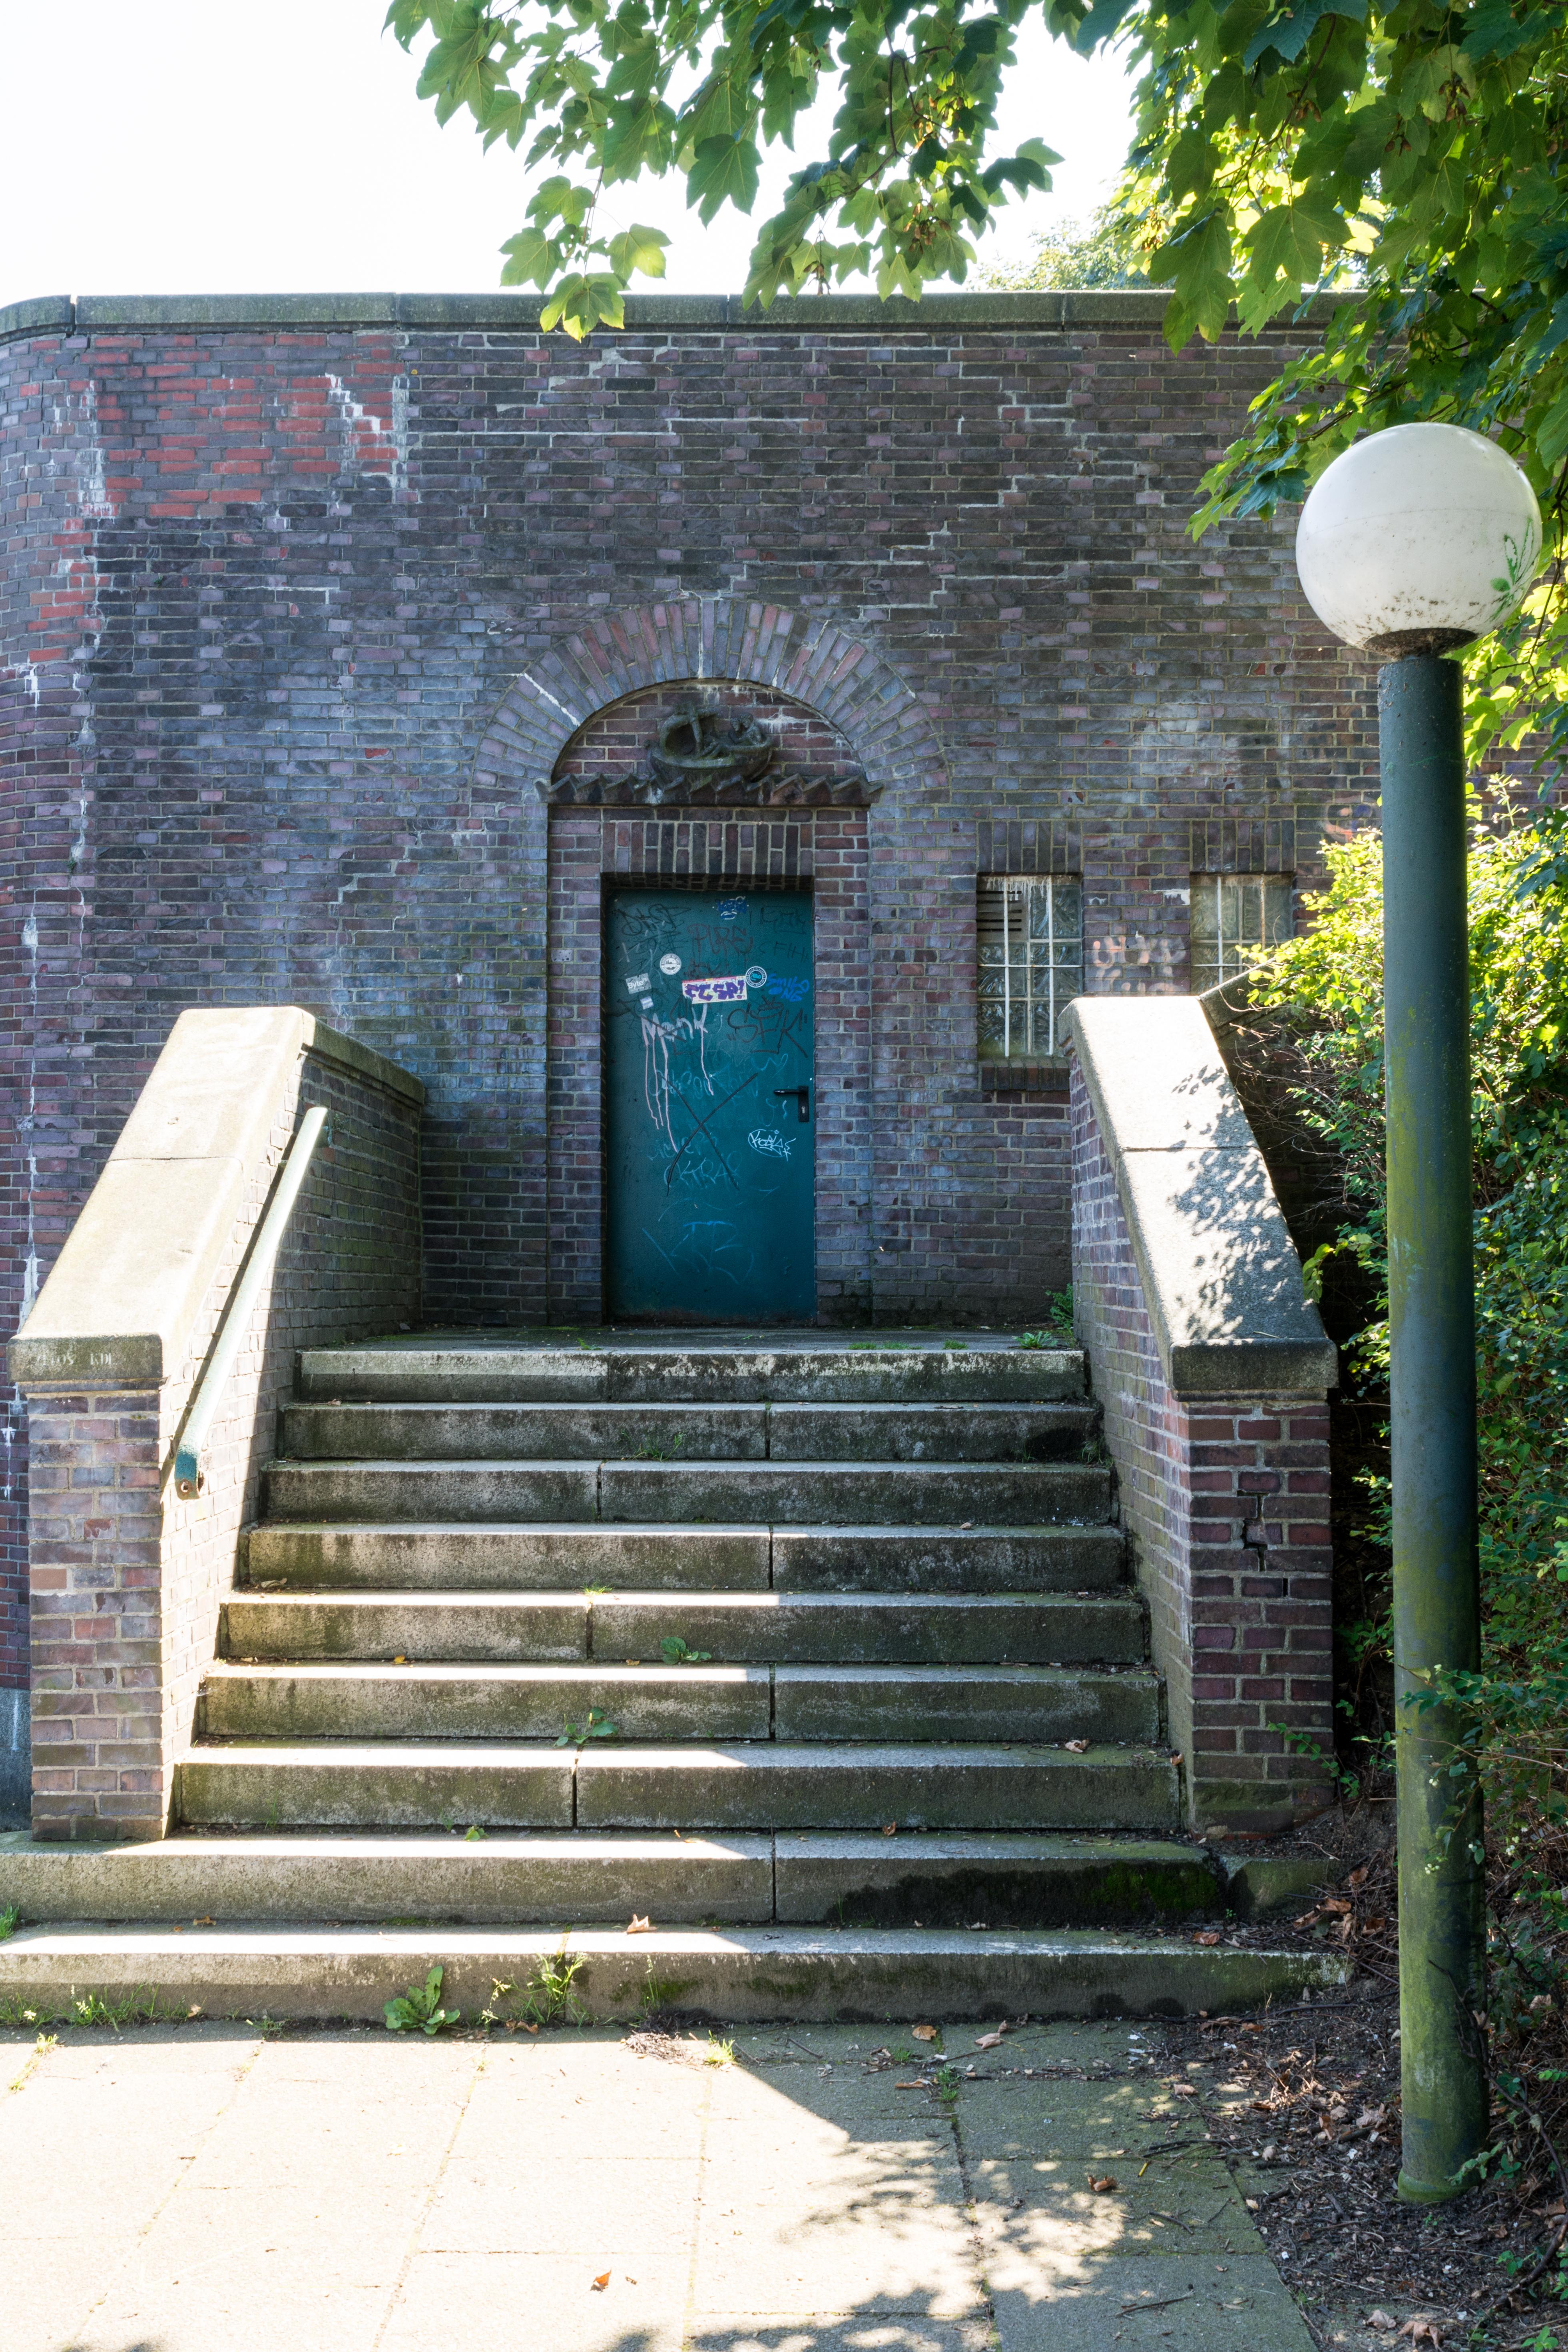 Treppenrenovierung Hamburg file krugkoppelbrücke hamburg seite zum alsterkanal treppe zum